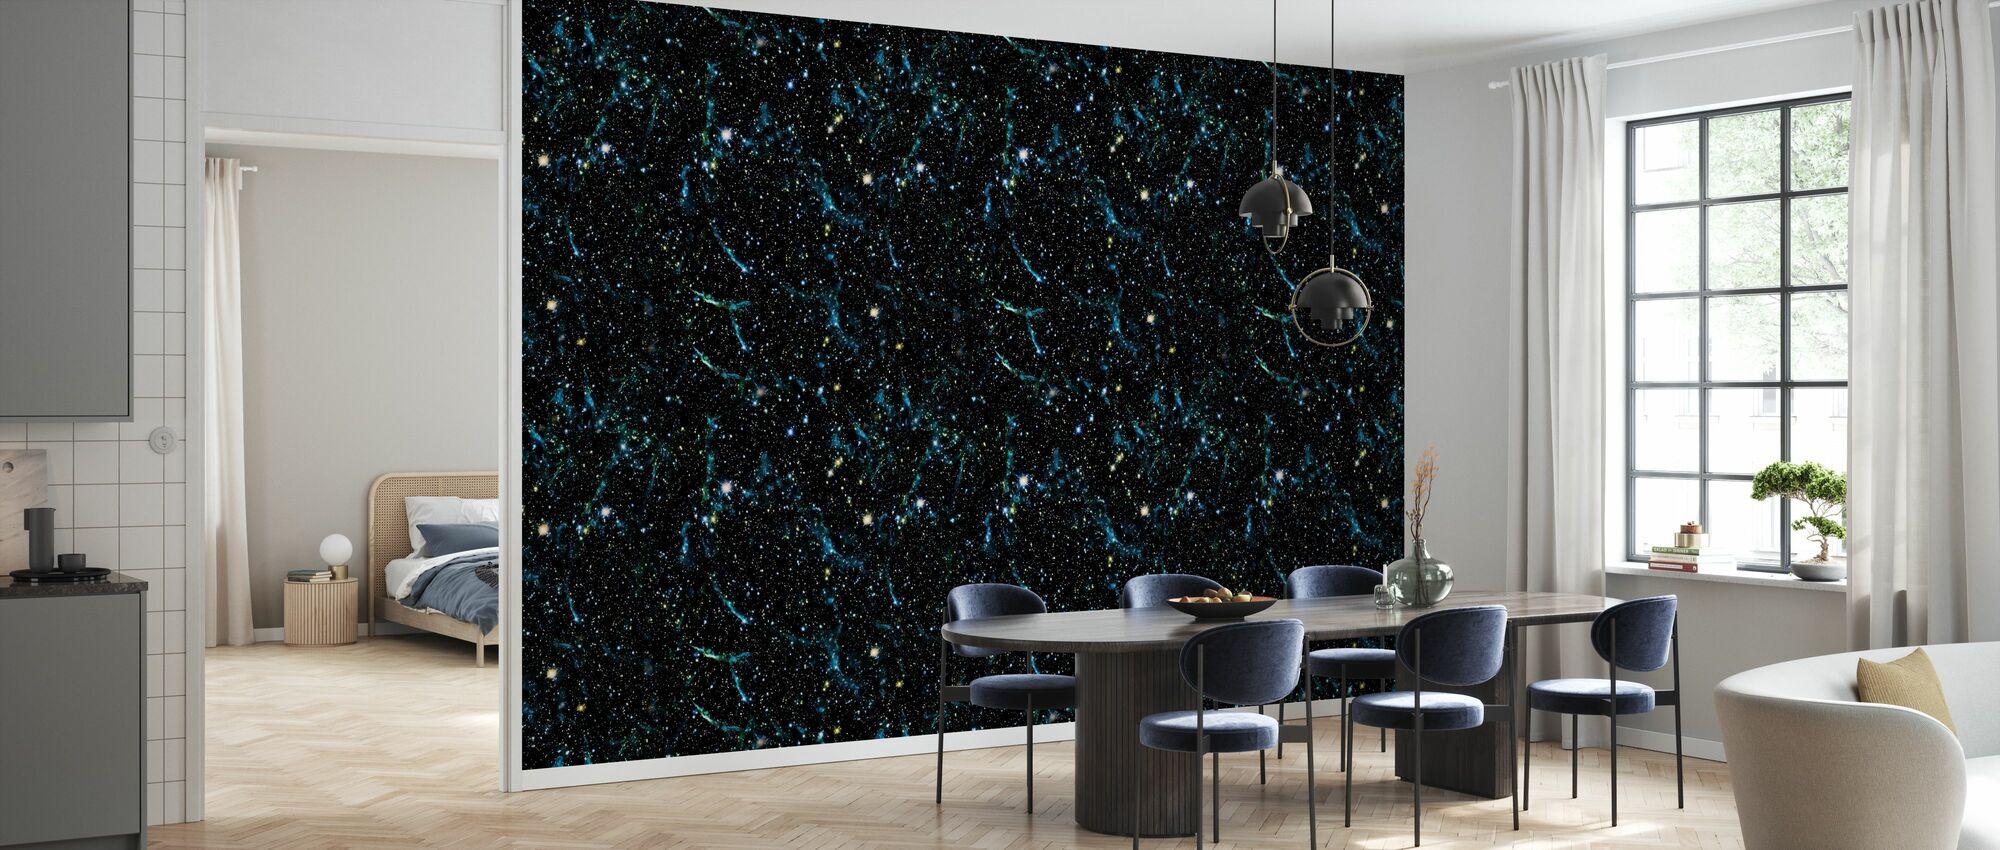 Teal Sea - Wallpaper - Kitchen